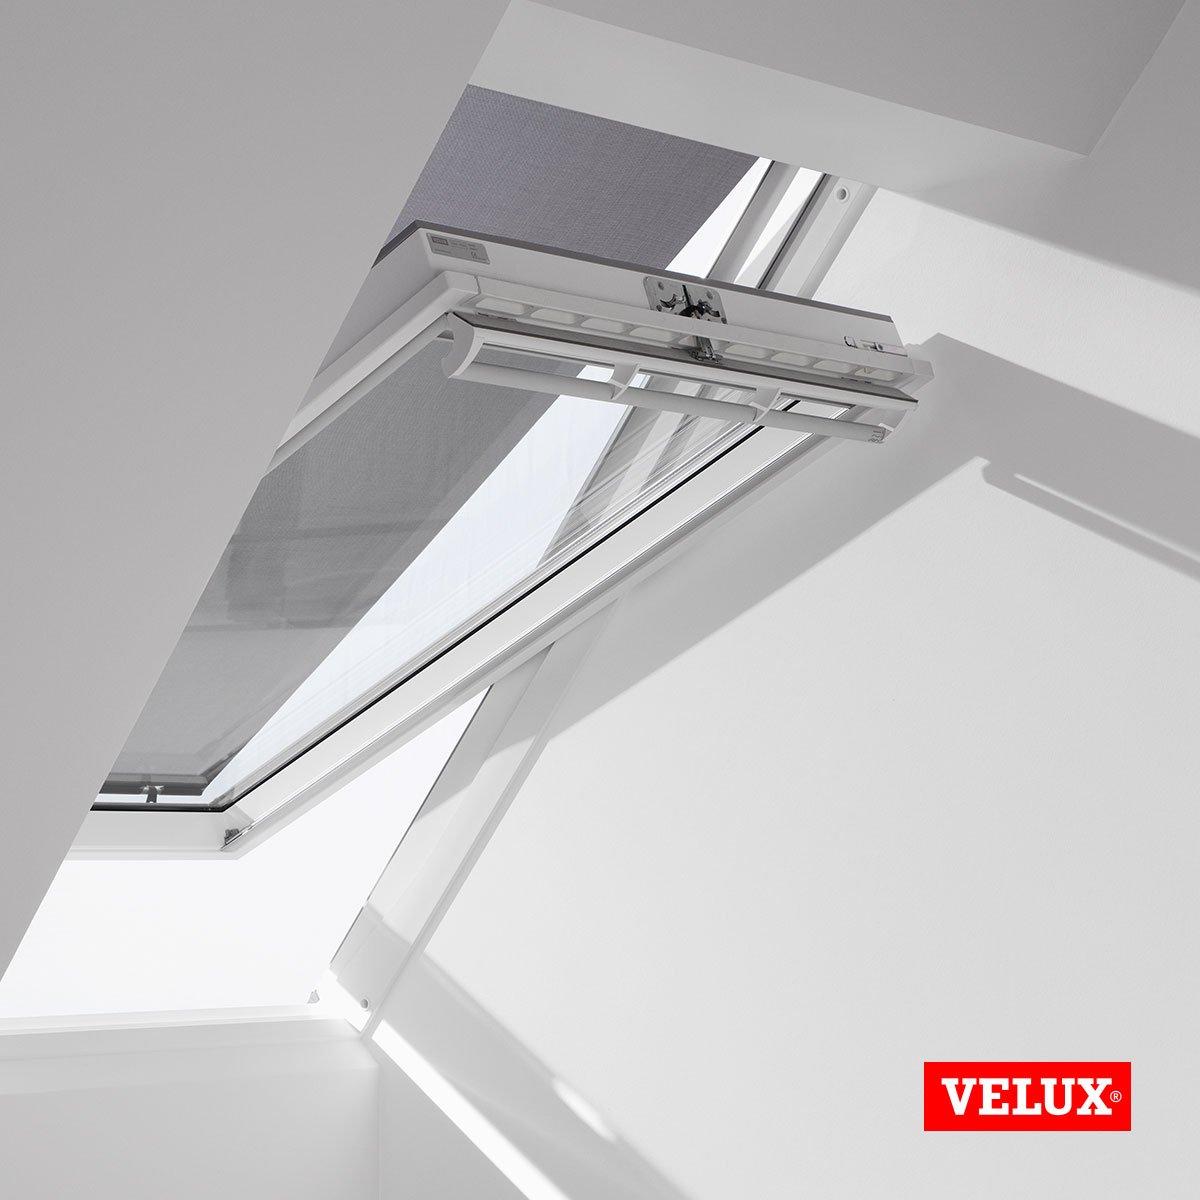 VELUX Blind For Roof Window Size SK06 SK08 SK10 S06 S08, S10, 606, 608 610  SK06 SK08 SK10 S06 S08, 606/608/610: Amazon.co.uk: Kitchen U0026 Home